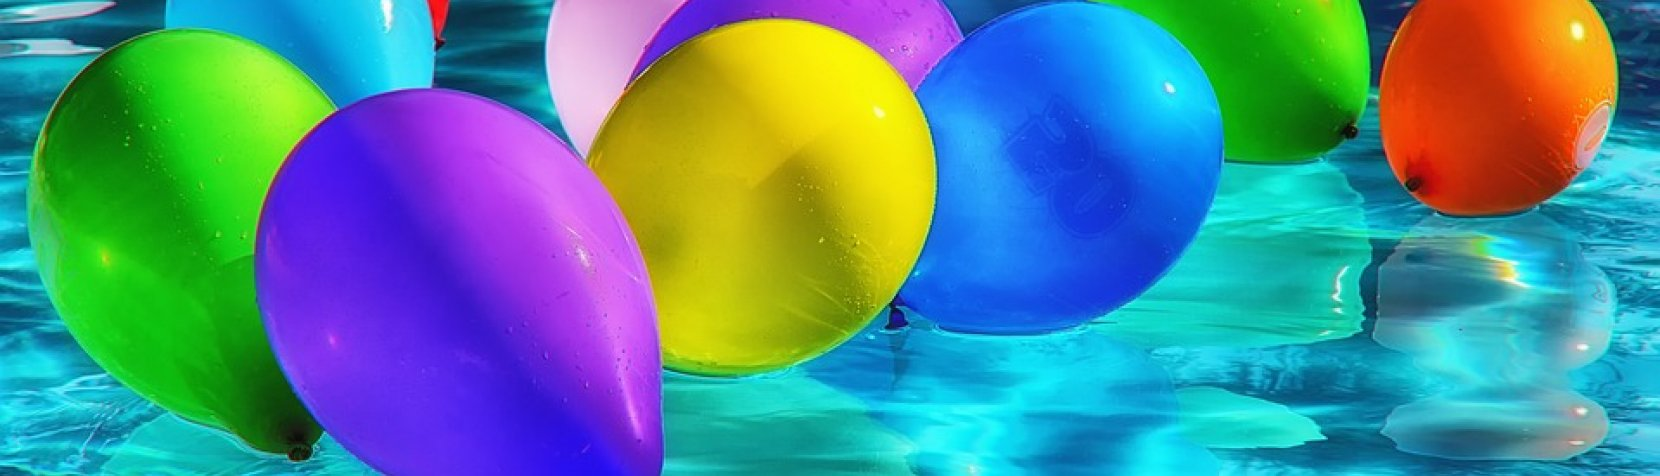 Foto: Balloner i svømmehal